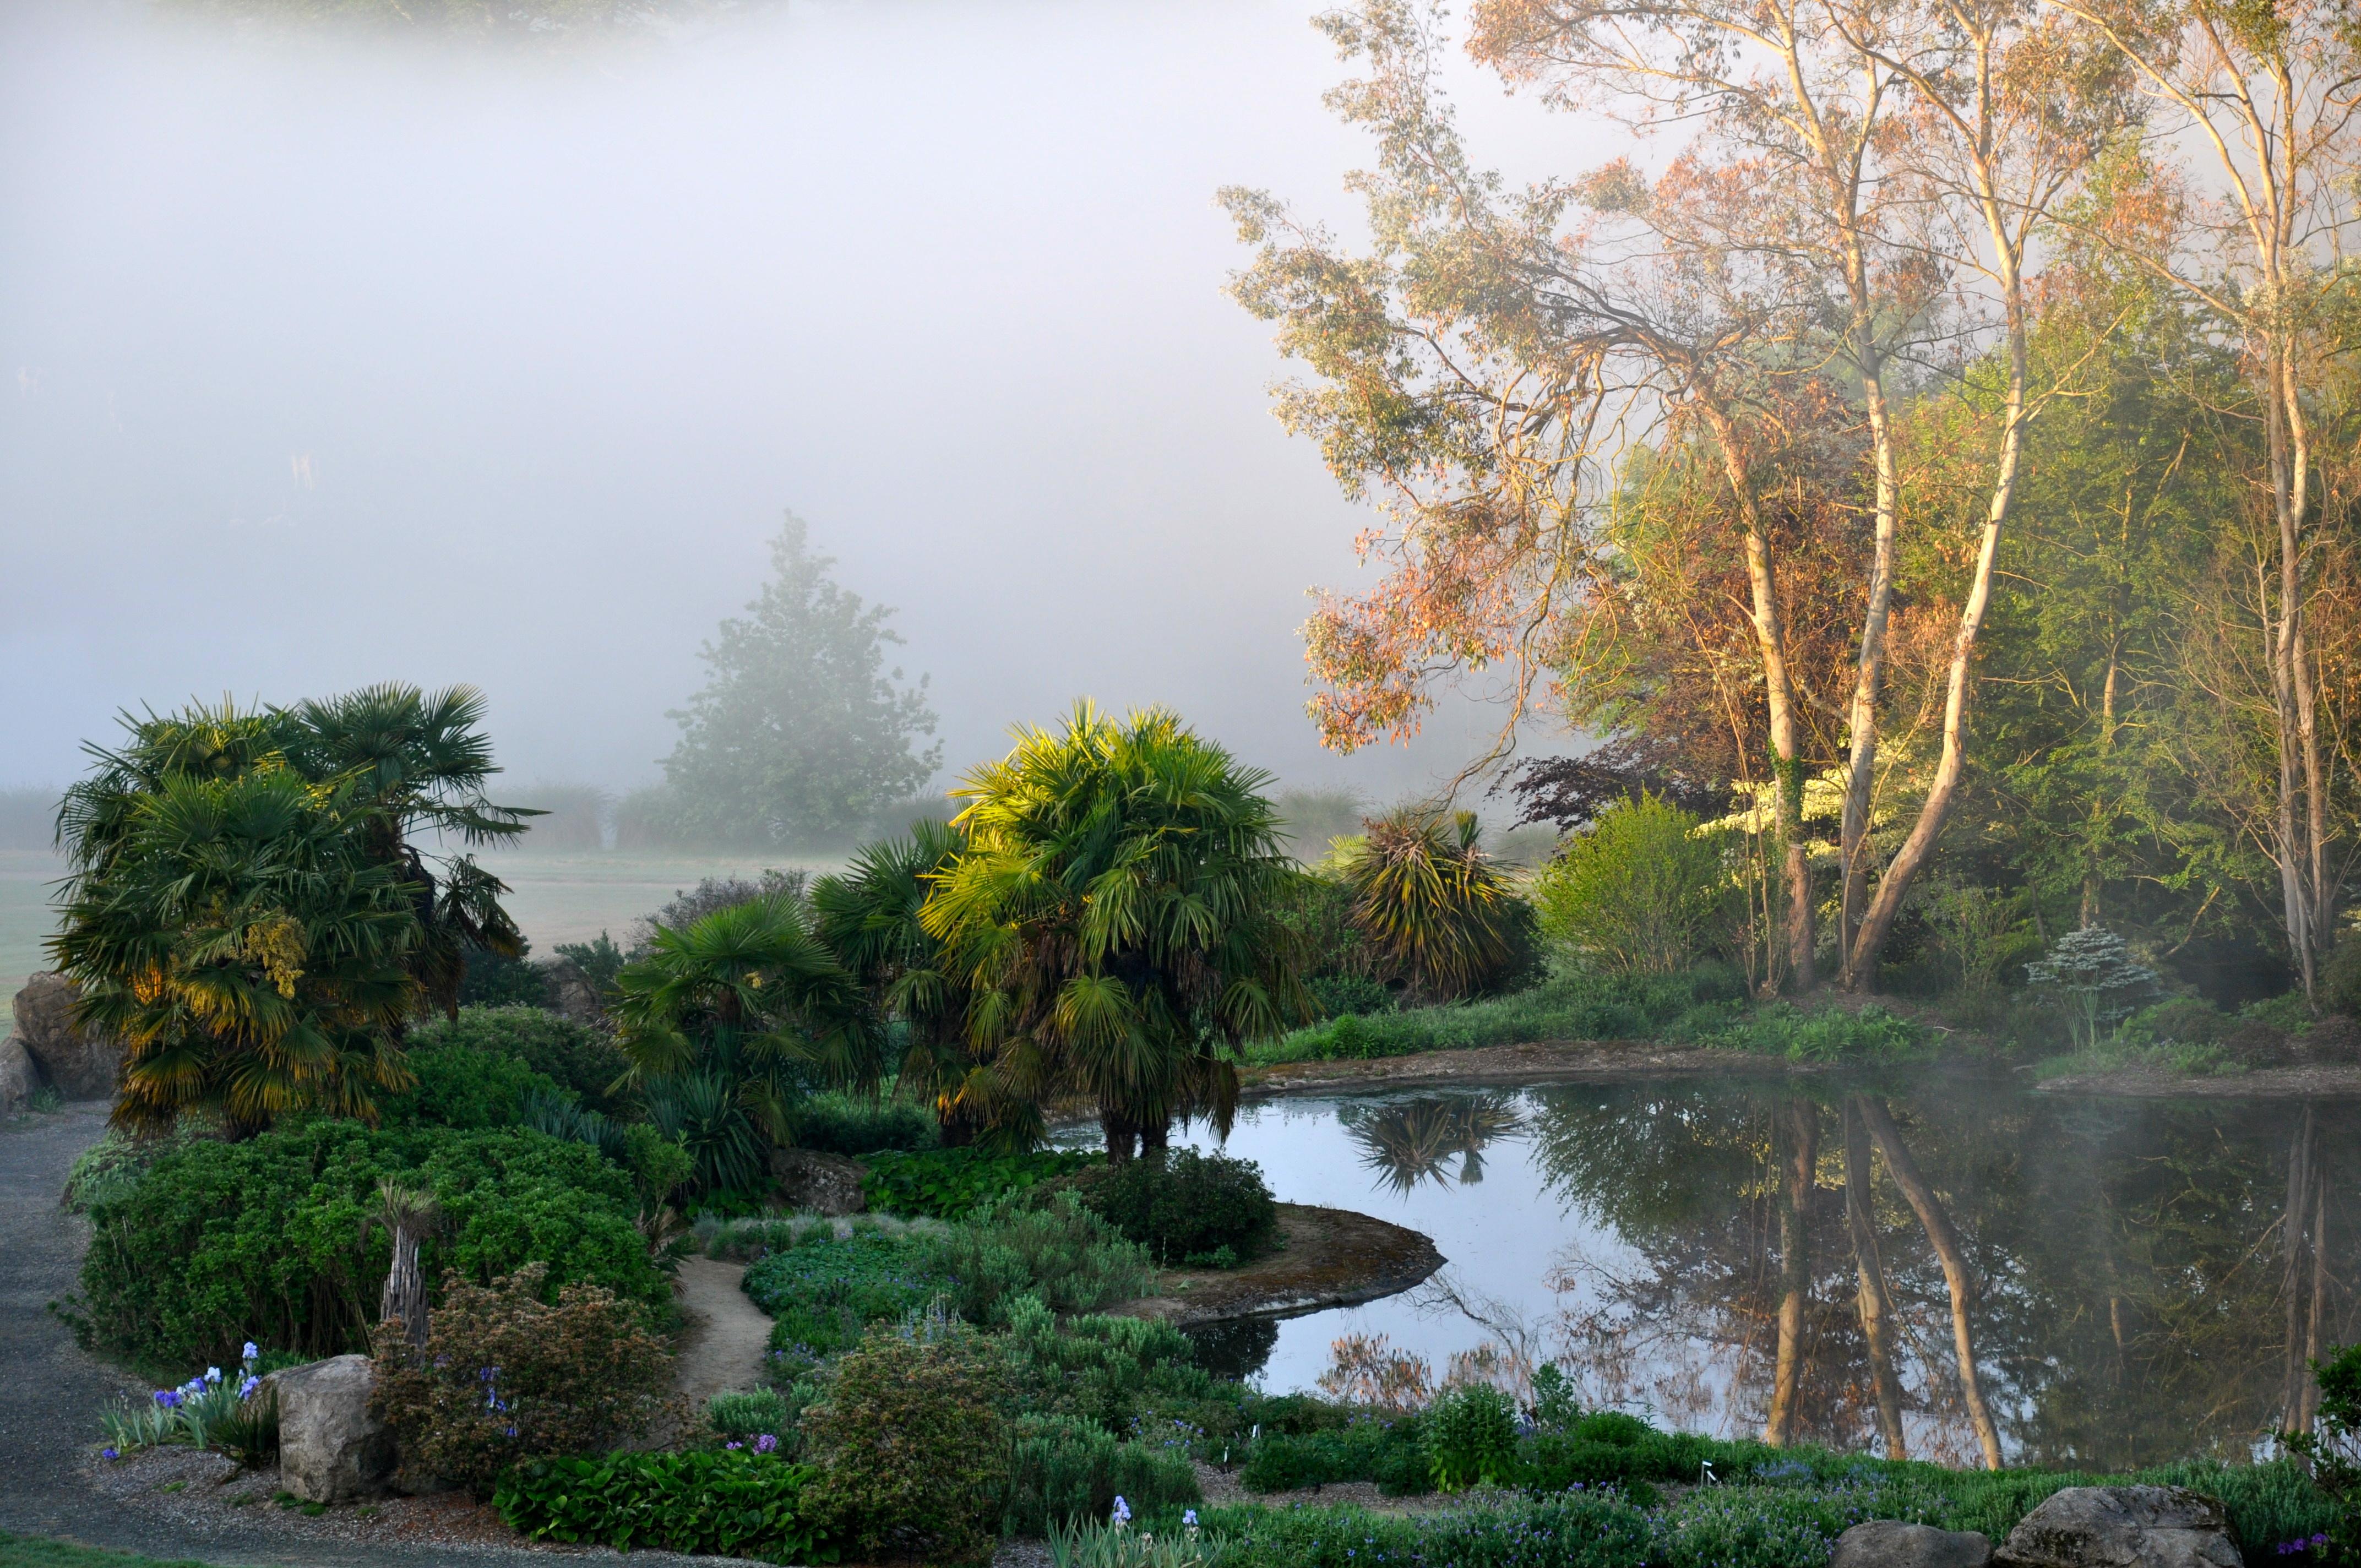 Botanical garden of upper brittany wiki everipedia for Auberge le jardin de la source